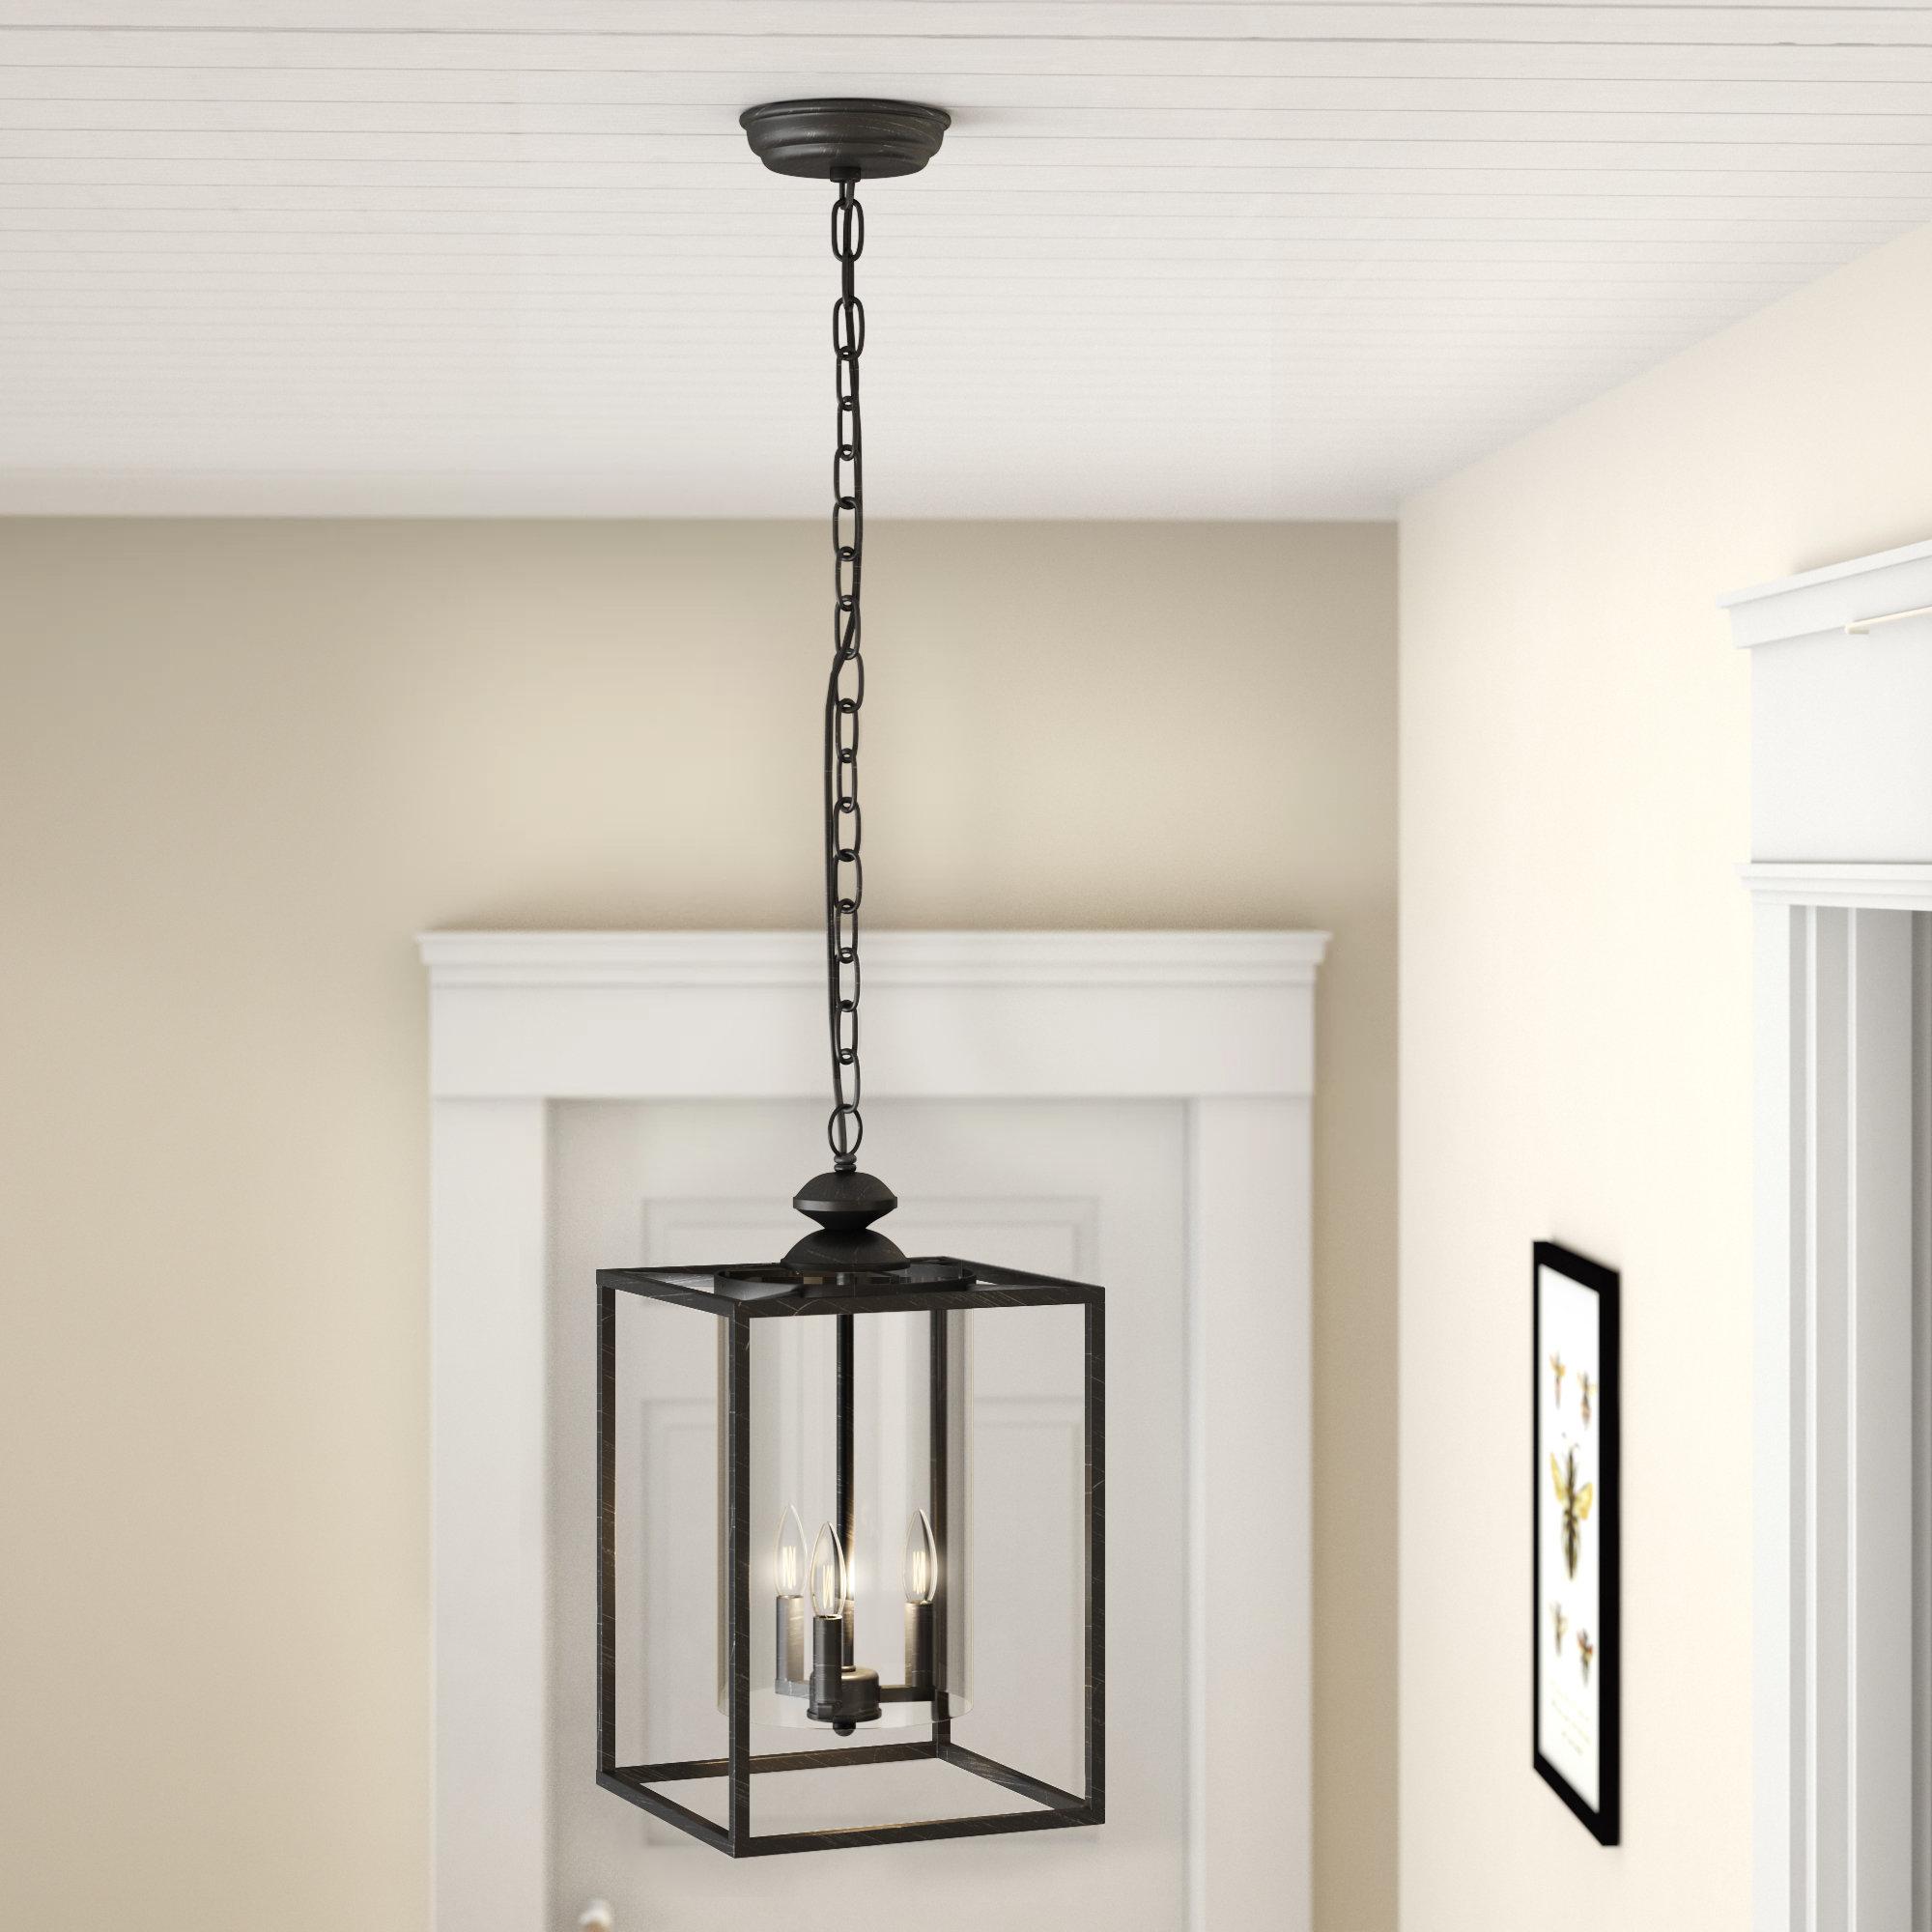 Chesson 3 Light Lantern Square/rectangle Pendant Regarding Favorite Finnick 3 Light Lantern Pendants (View 3 of 25)